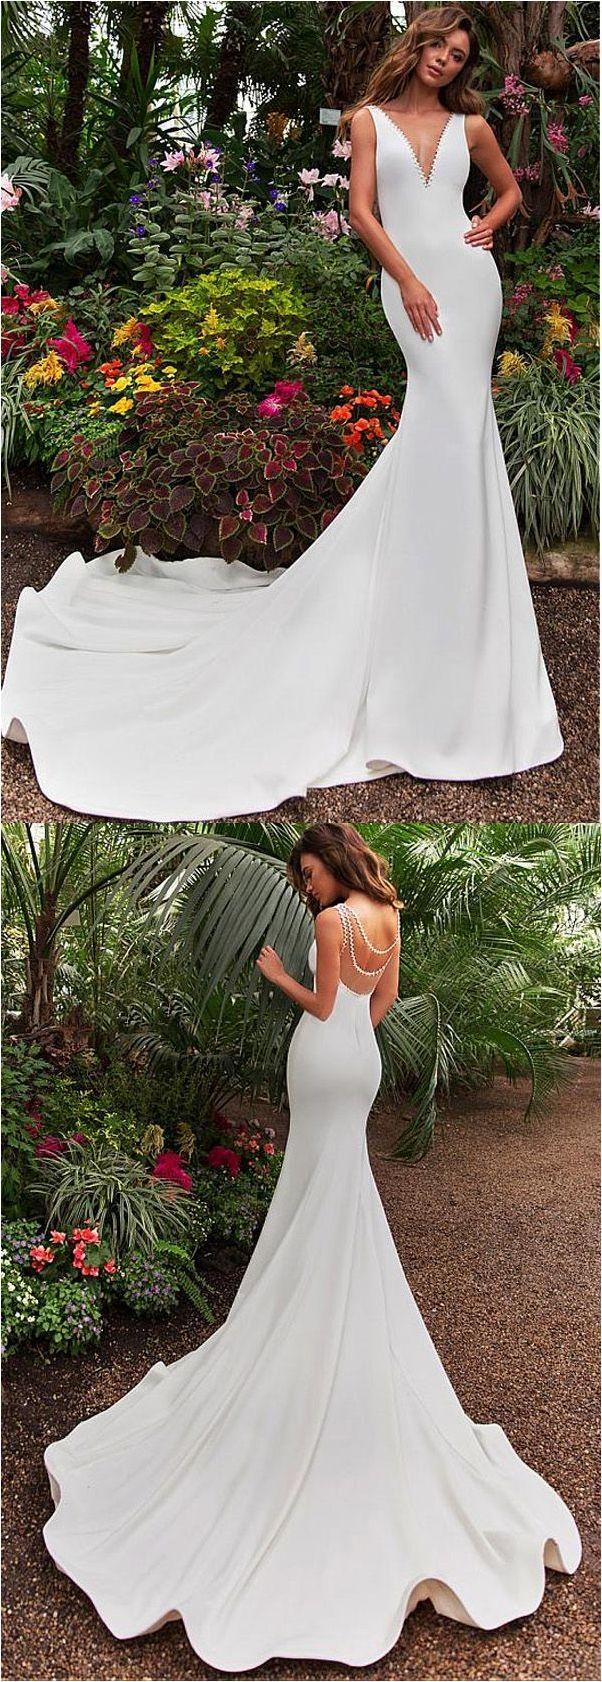 Custom made wedding dress  Wedding Dresses Simple Take a look at your favorite luxury custom